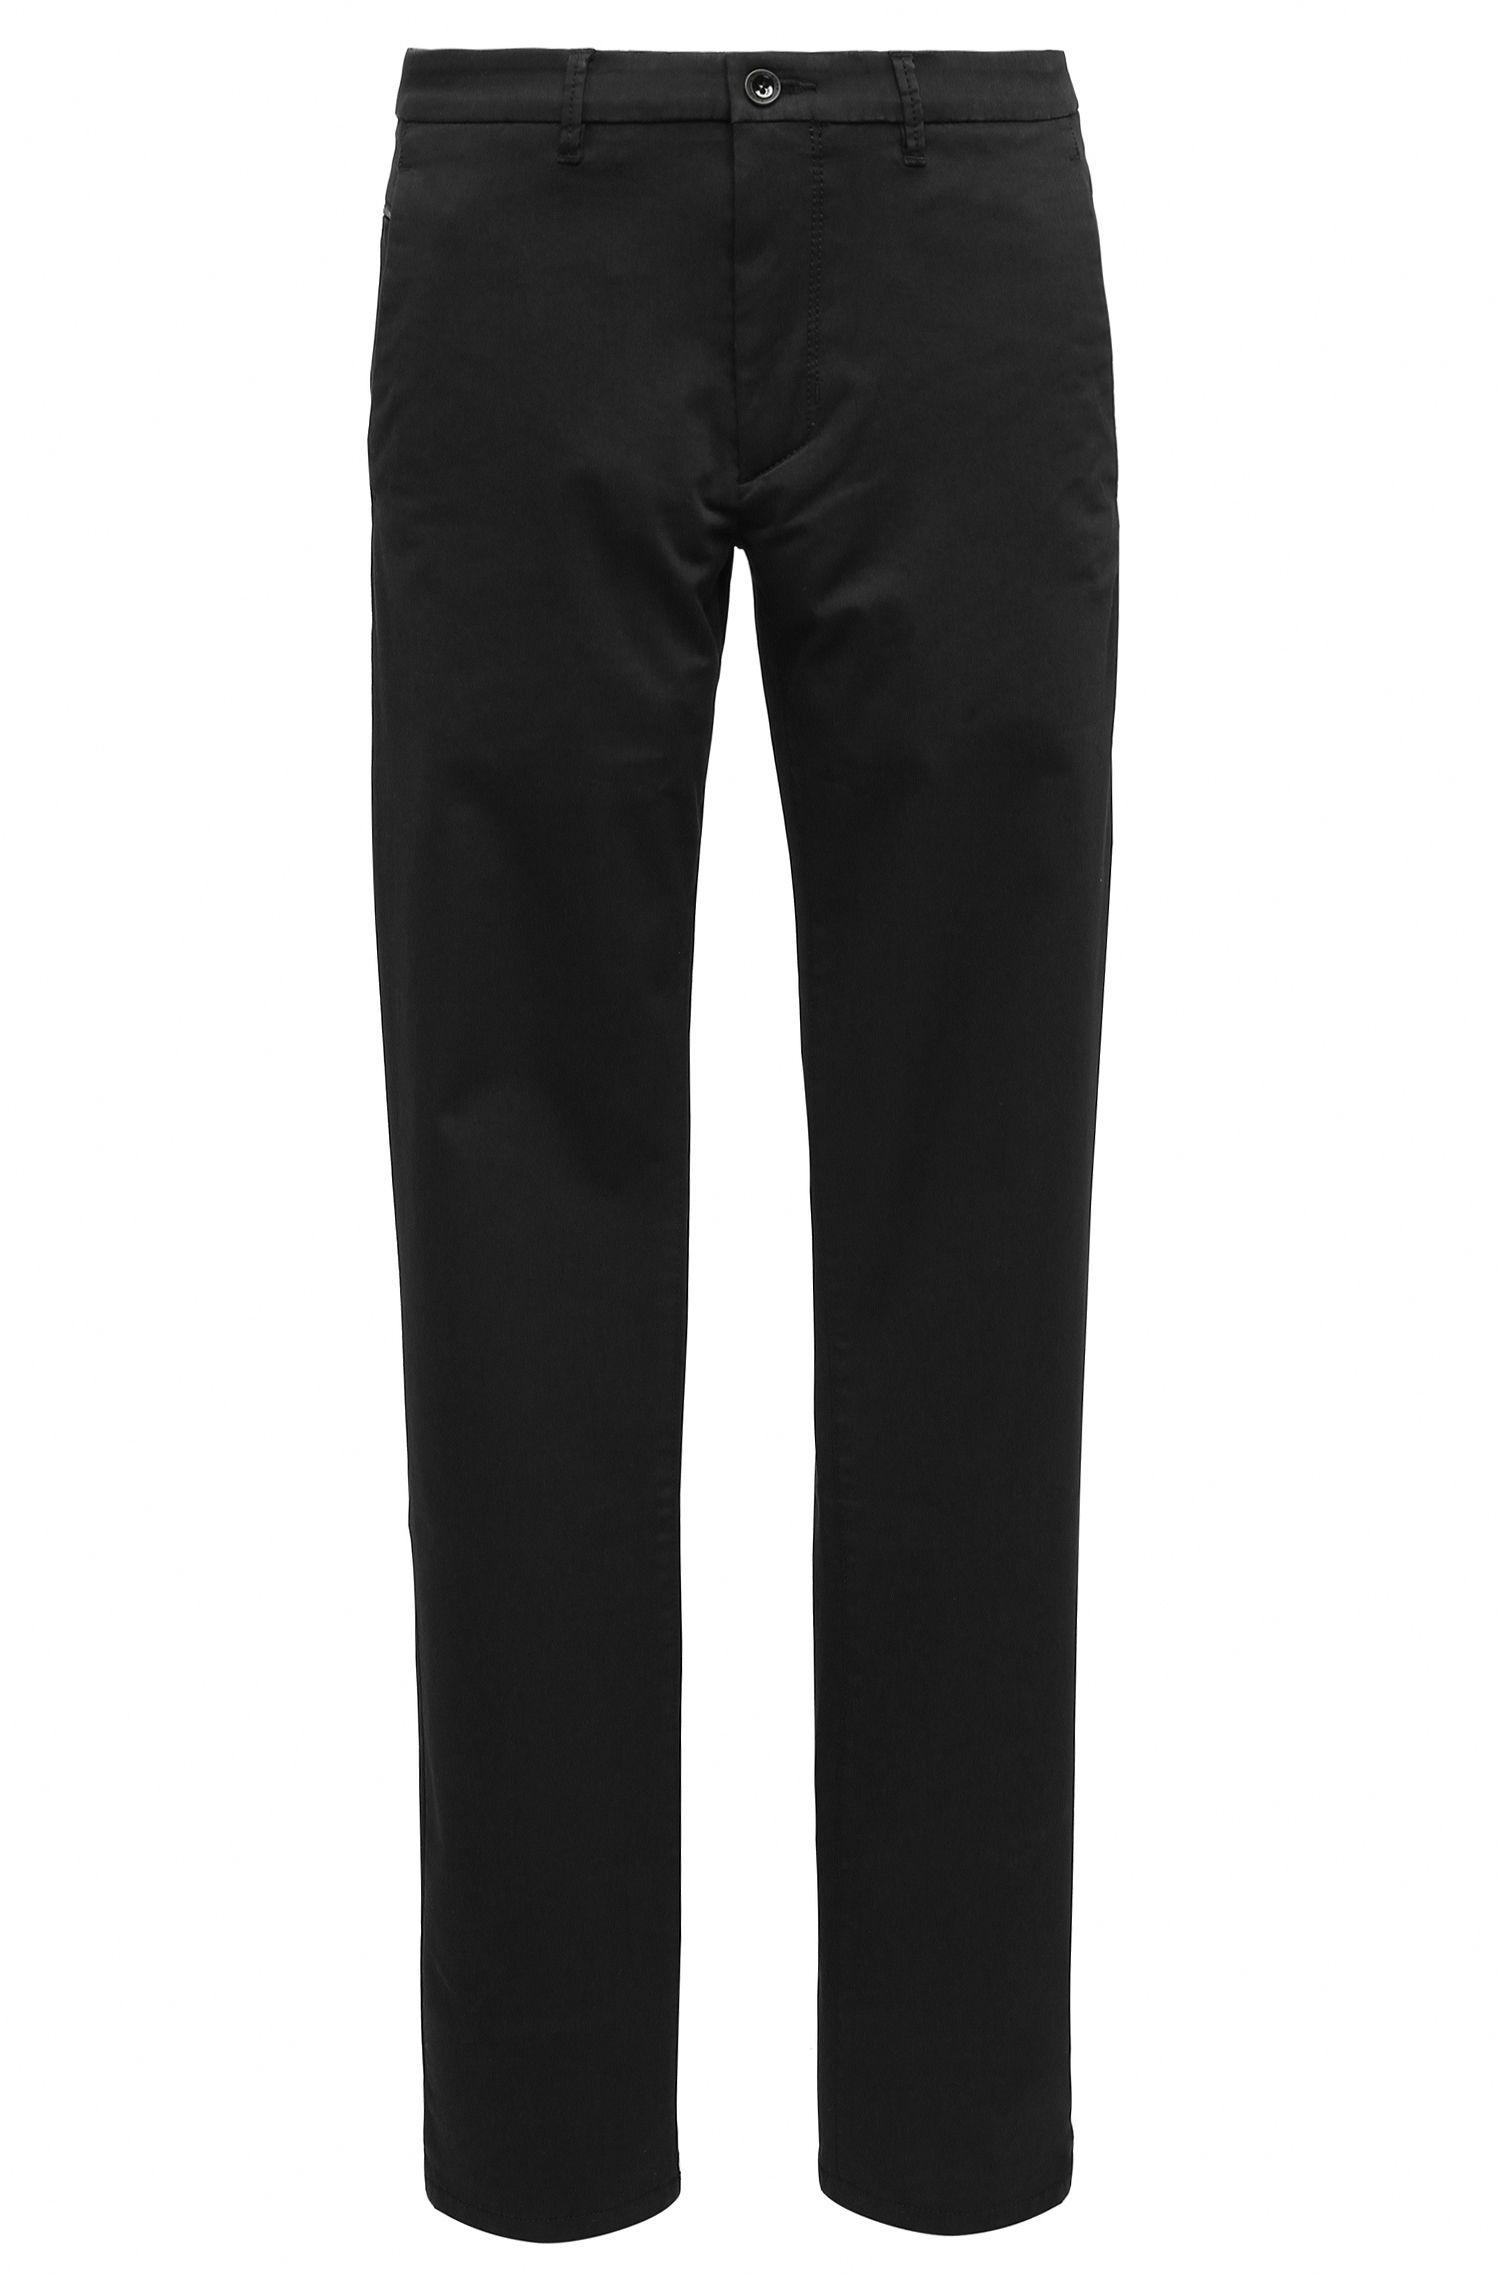 'Leeman-W' | Slim Fit, Stretch Cotton Blend Pants